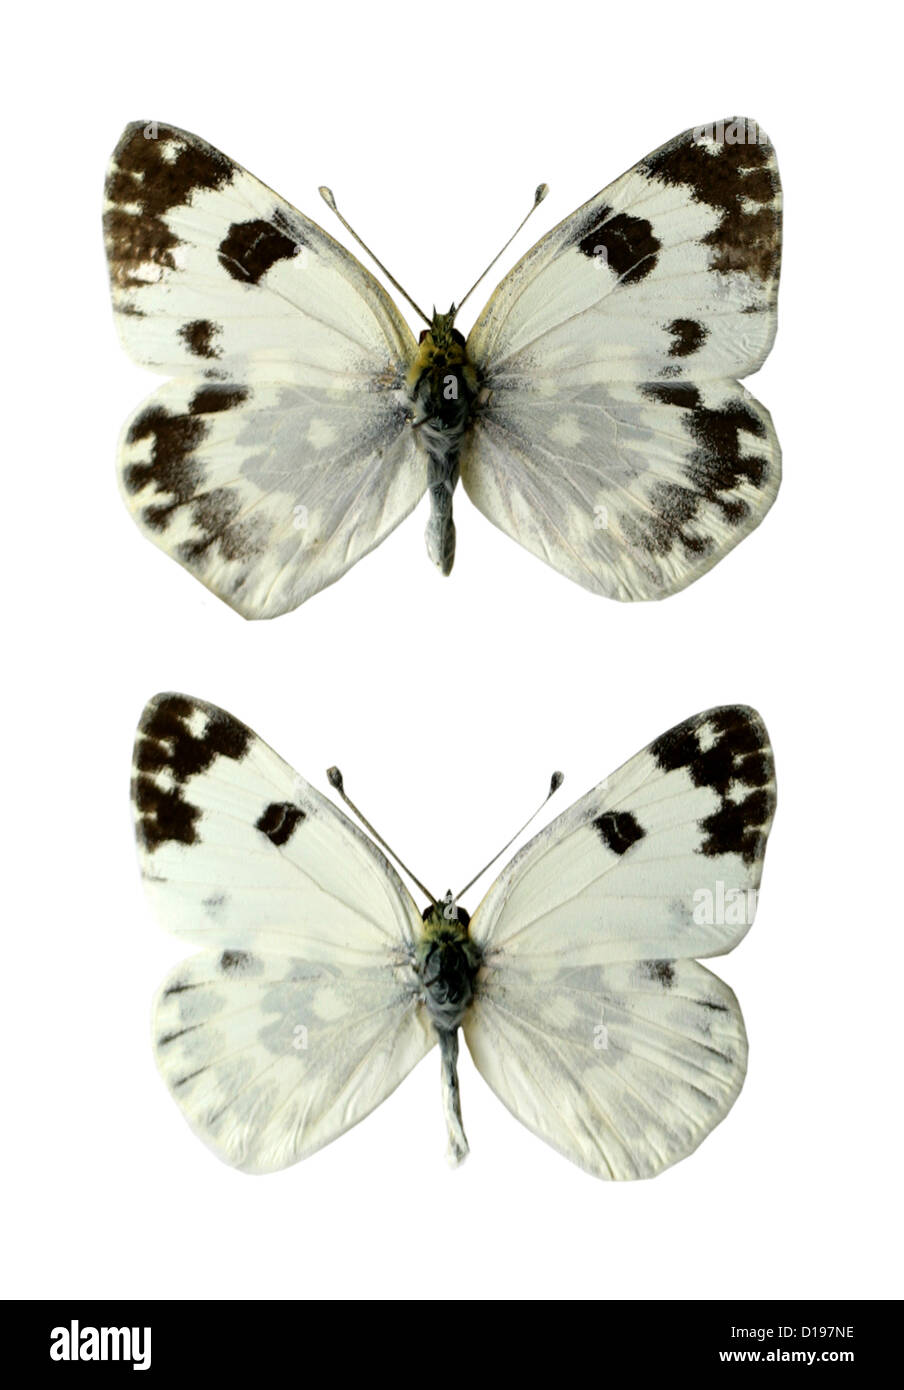 Bath White Butterflies, Pontia daplidice, Pieridae, Lepidoptera. Female (top), Male (bottom). Stock Photo